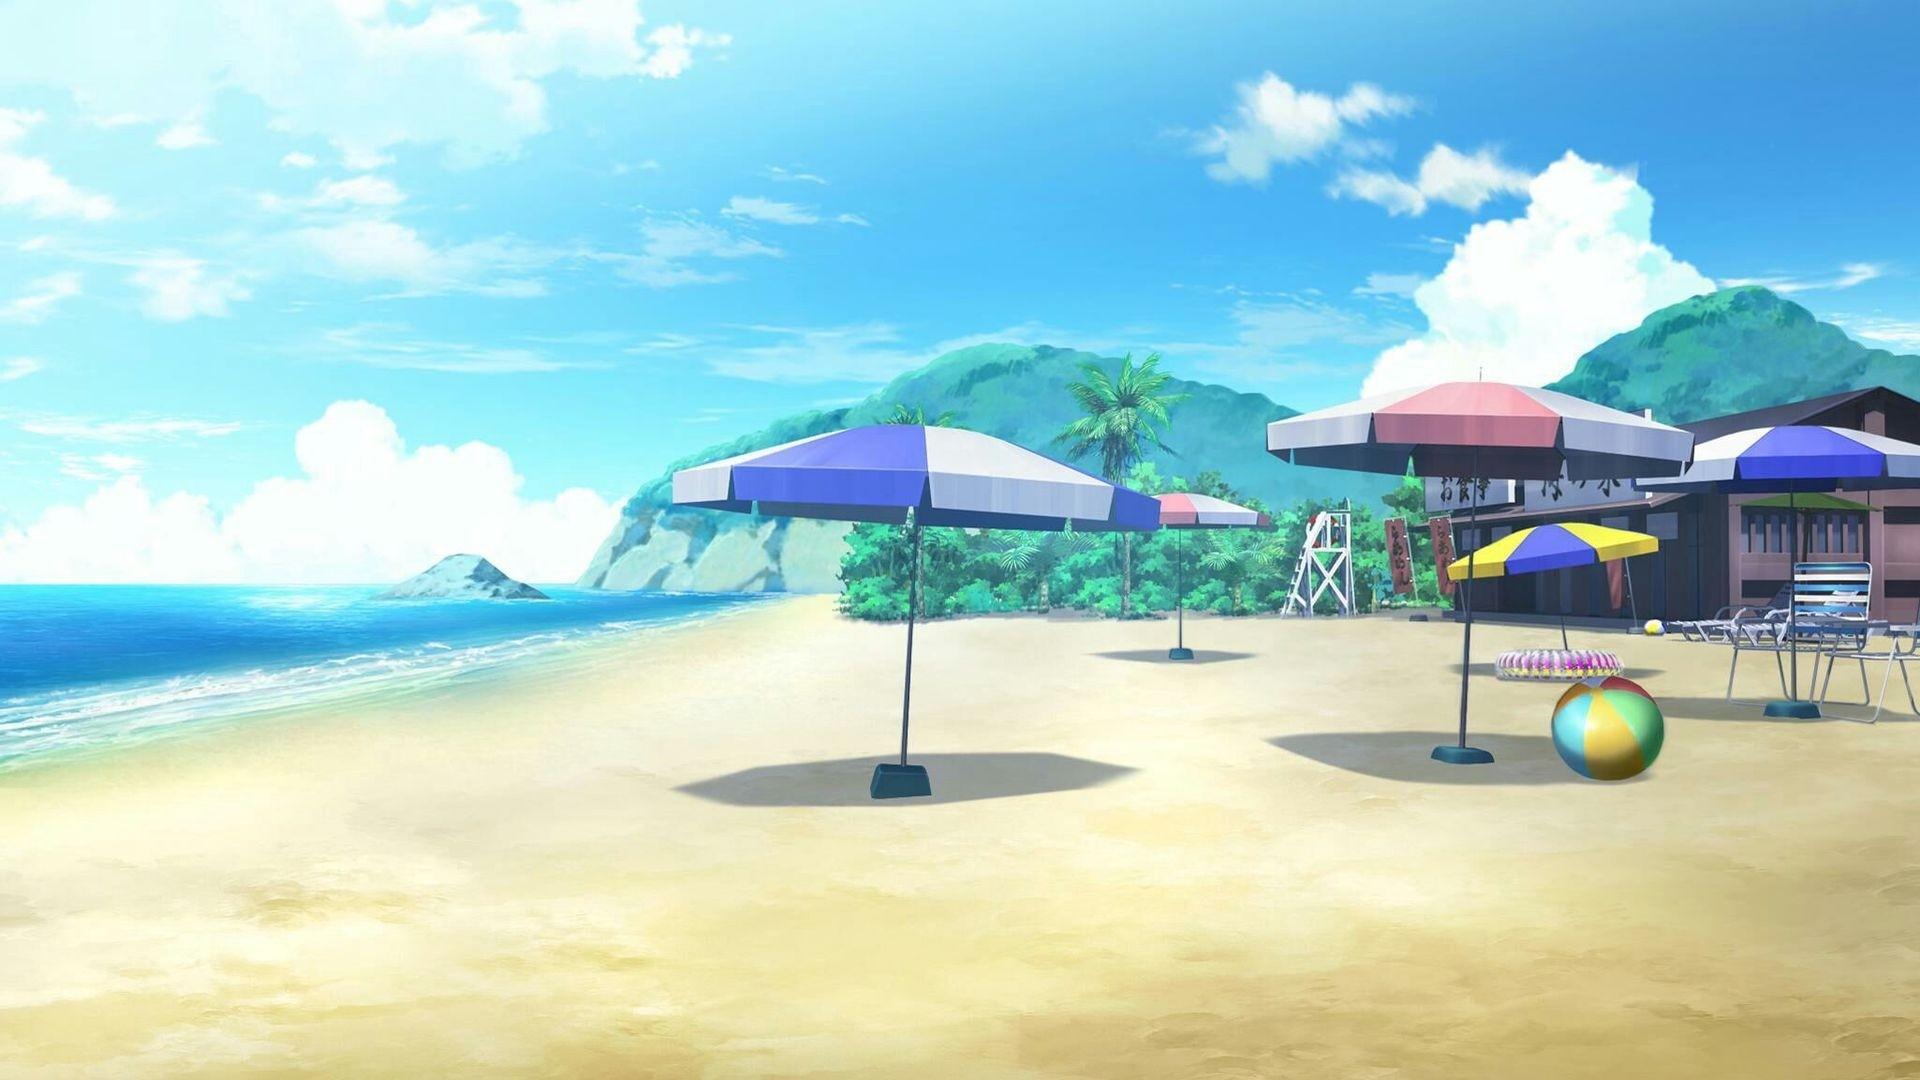 Anime Beach Wallpaper